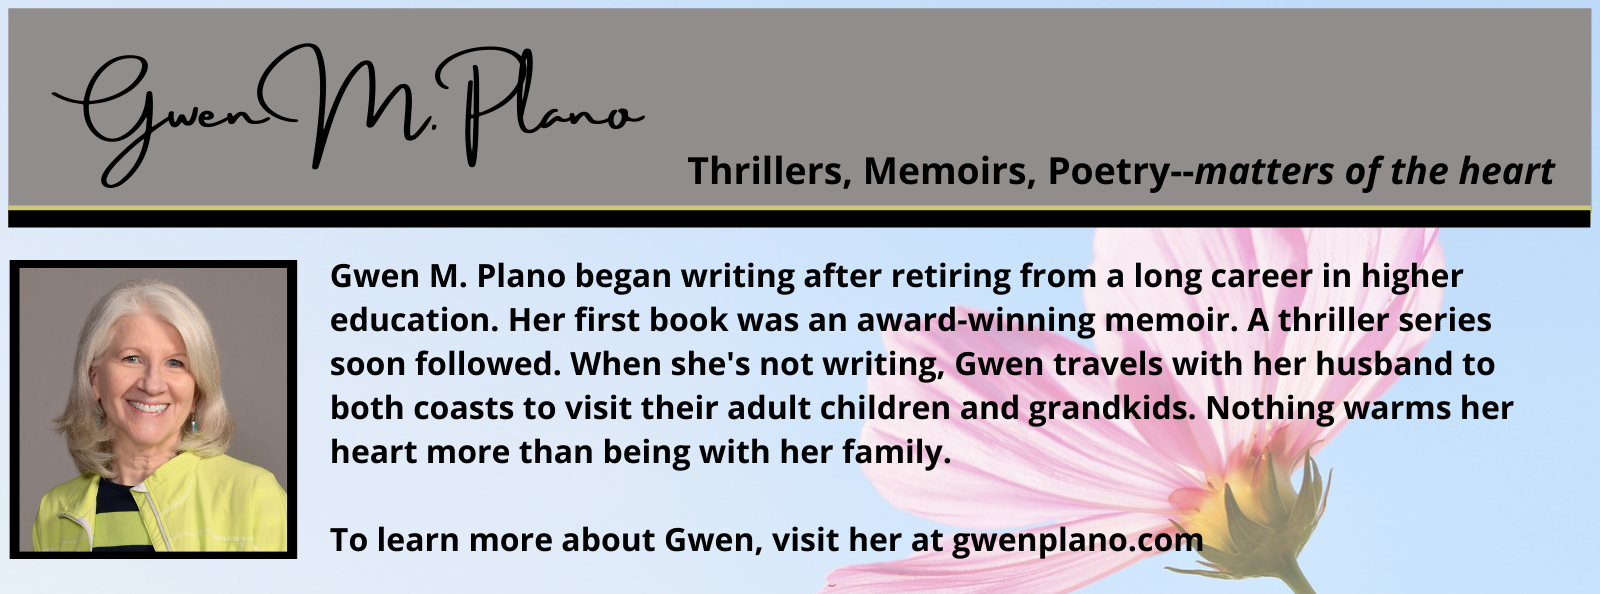 Bio box for Gwen Plano